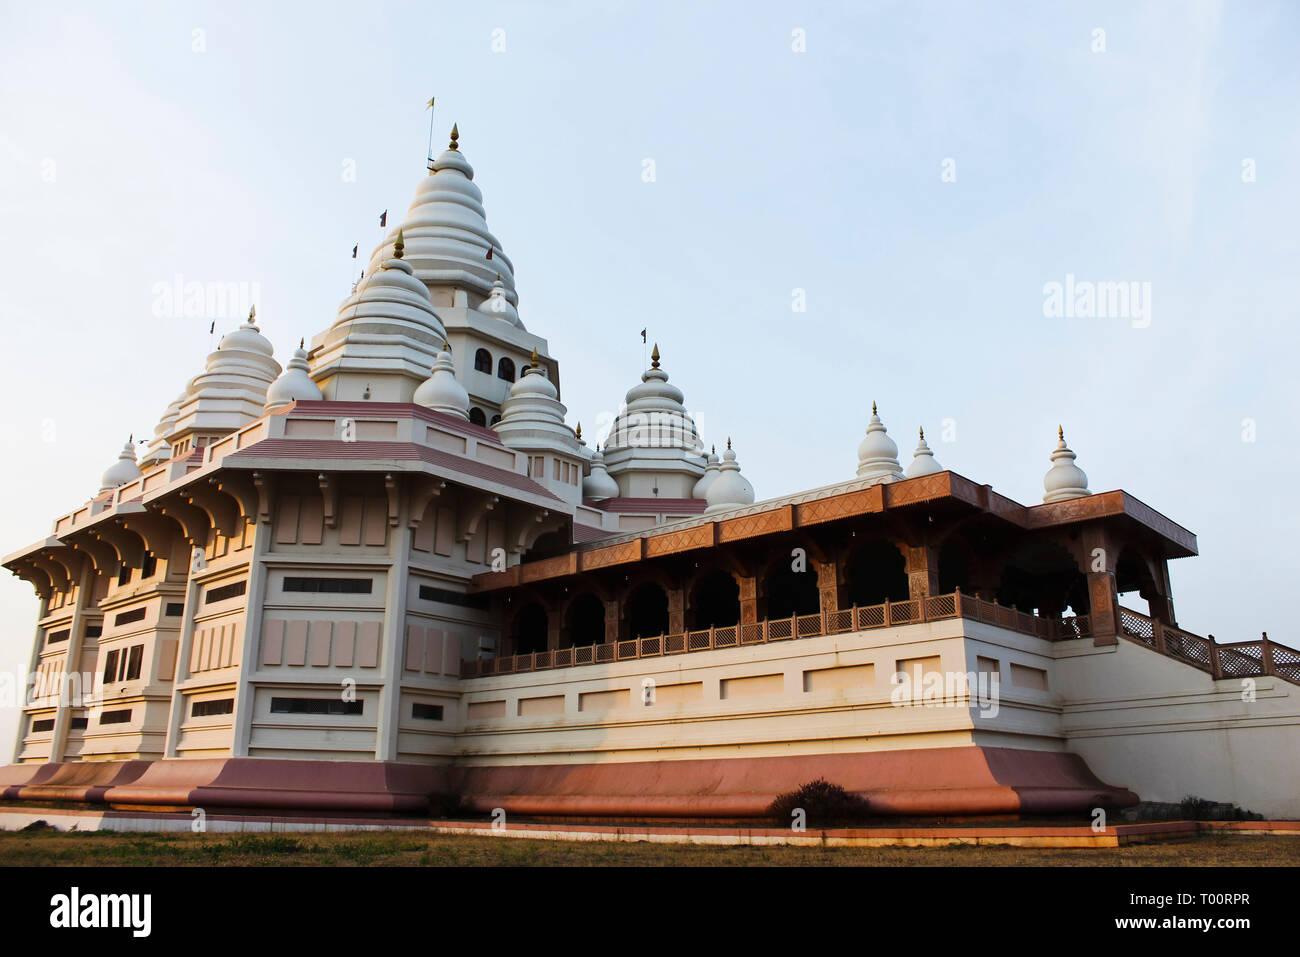 Gatha Mandir, abode of Sant Tukaram revered poet saint, Dehu, Maharashtra, India. - Stock Image